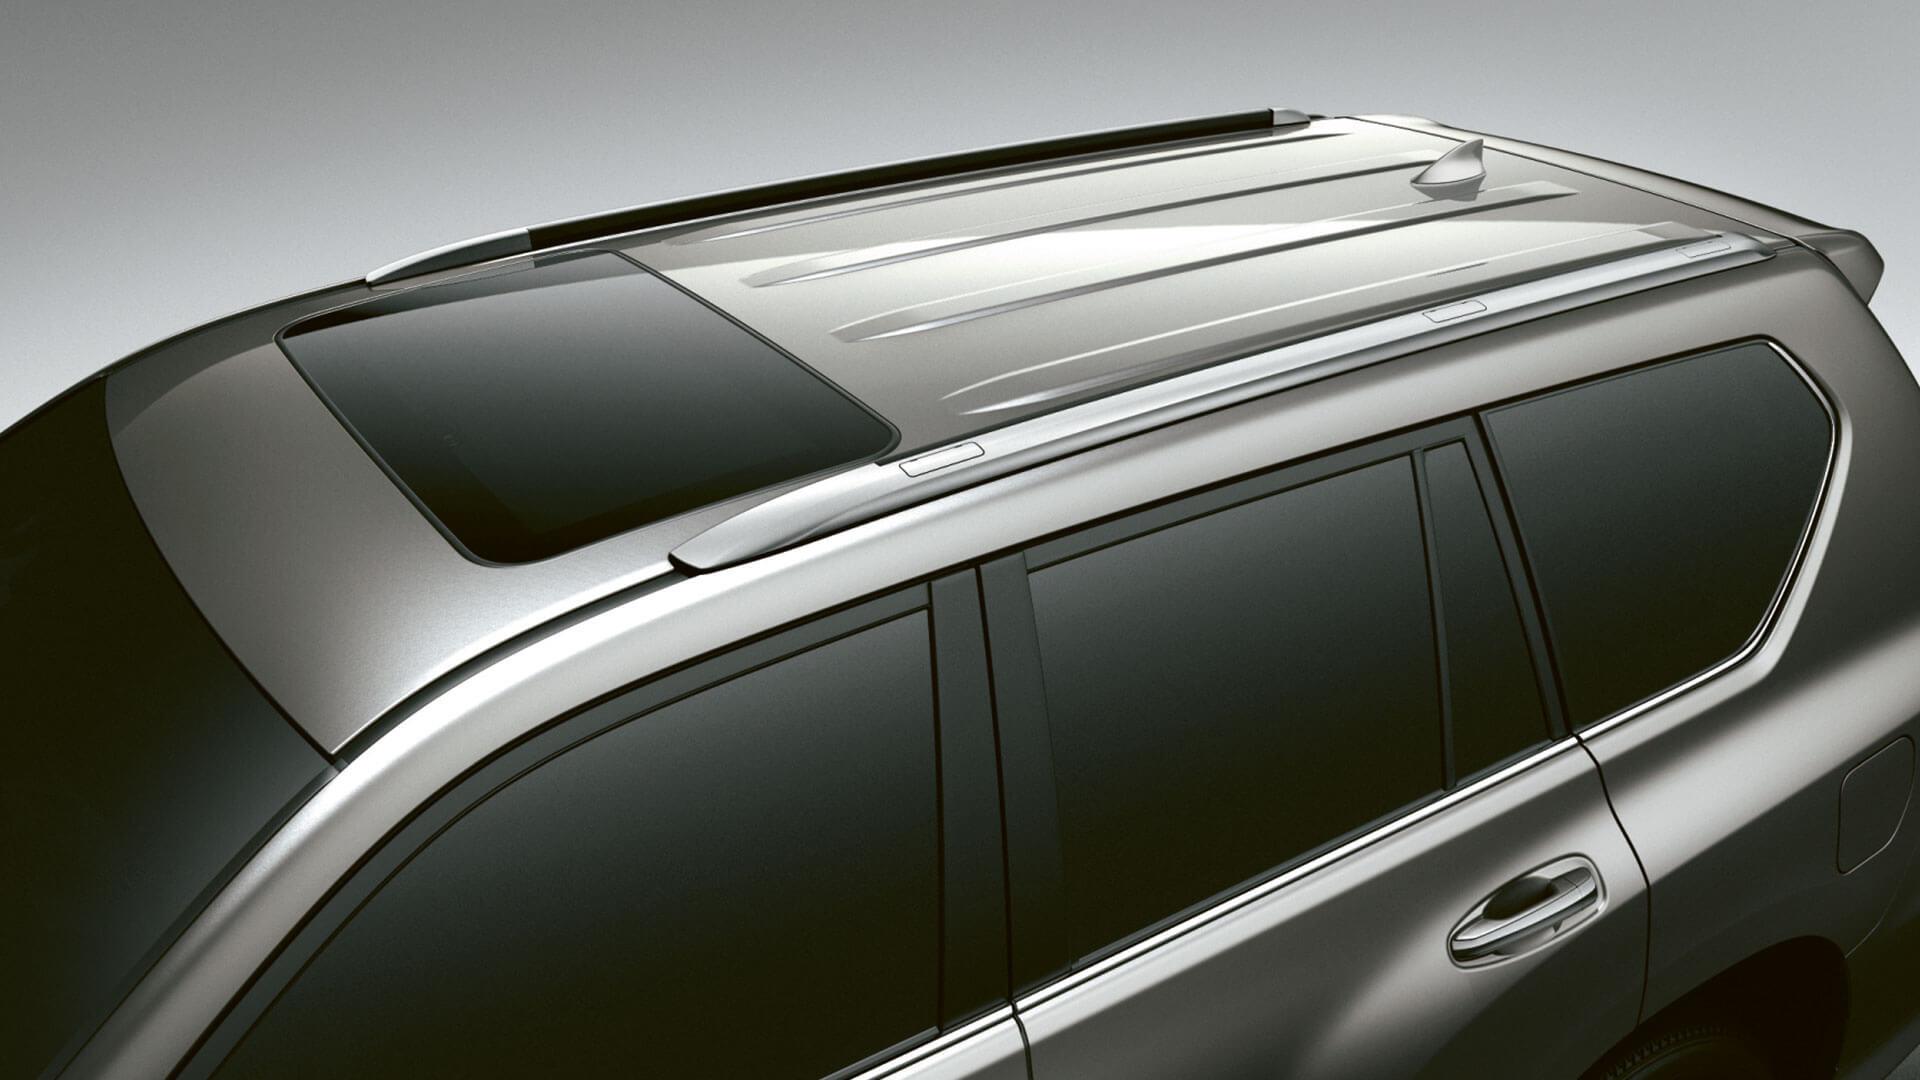 2019 lexus gx hotspot sunroof glass hatch heated windscreen